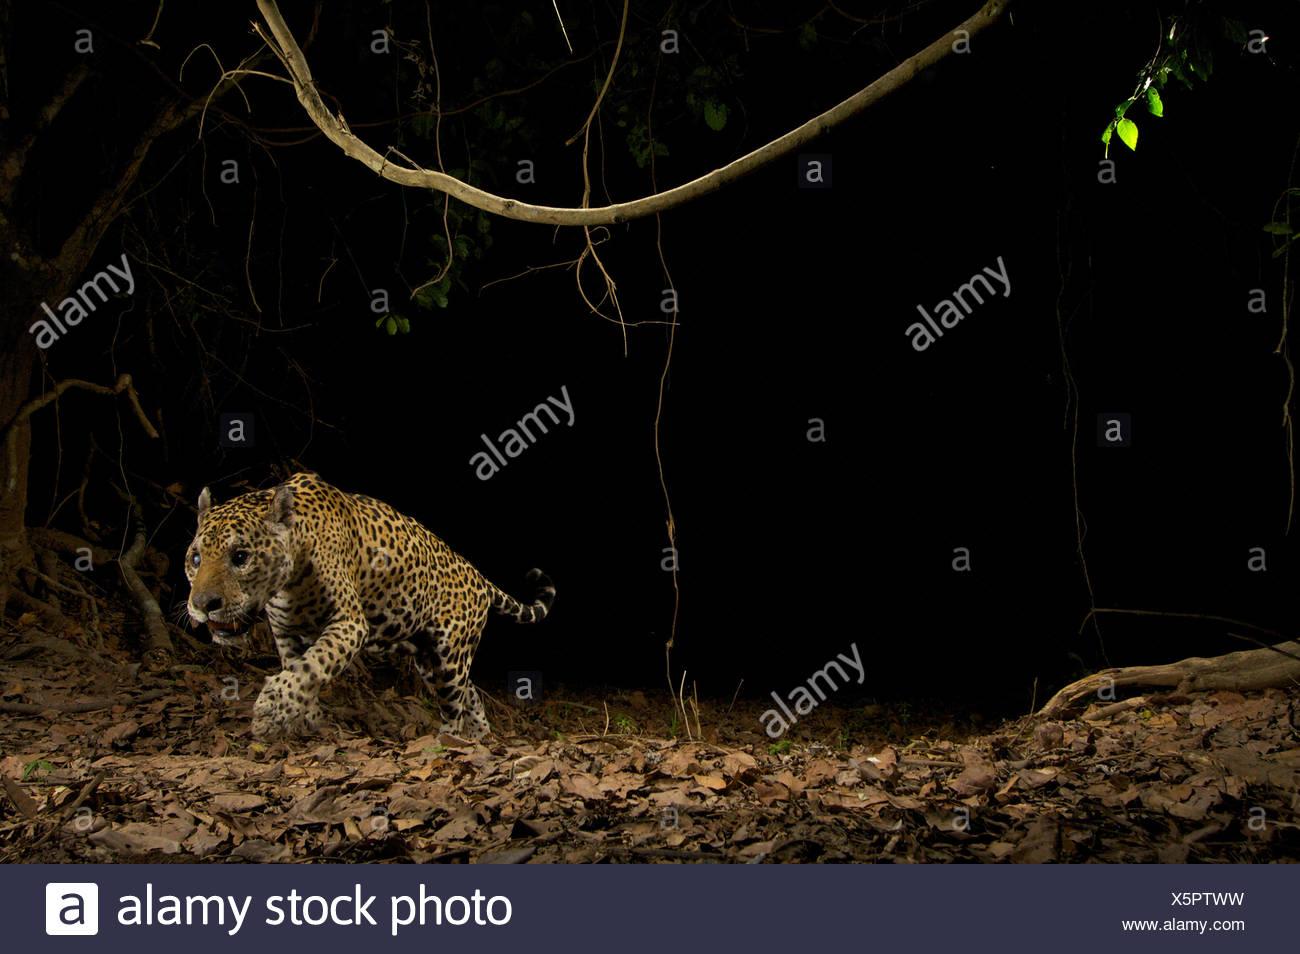 A wild jaguar sets off a camera trap set up to monitor jaguar movements in the Brazilian Pantanal. - Stock Image